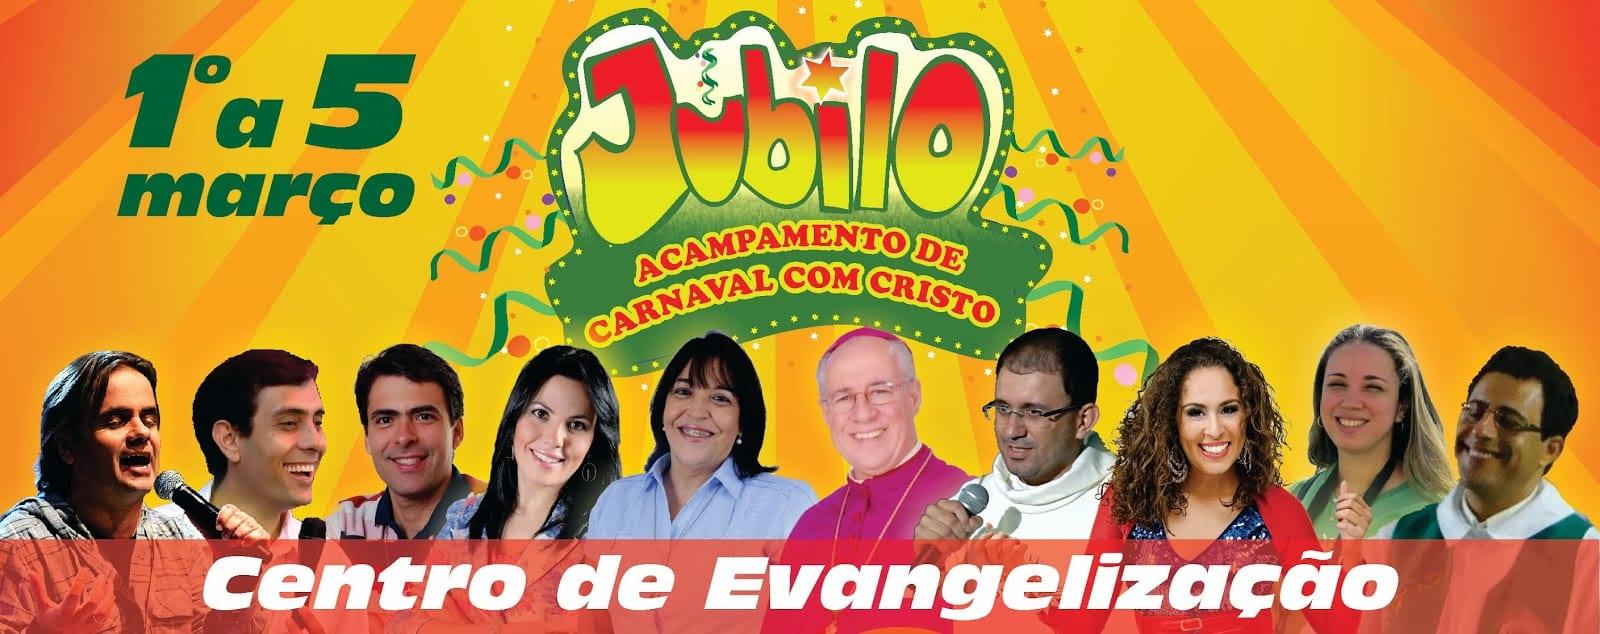 banner site jubilo